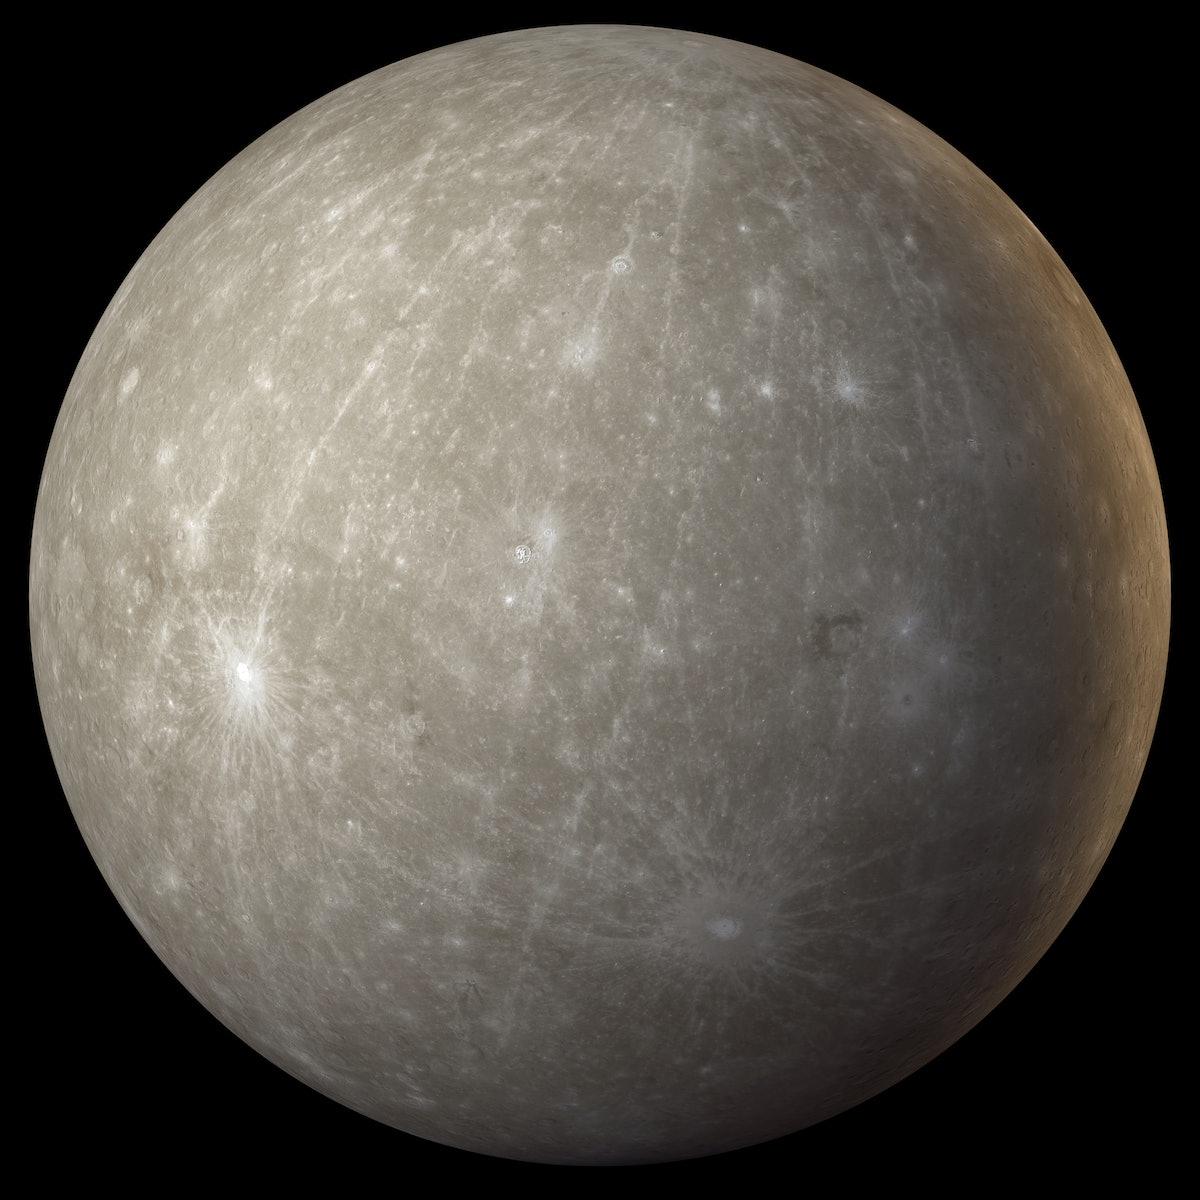 The planet Mercury during Mercury retrograde.